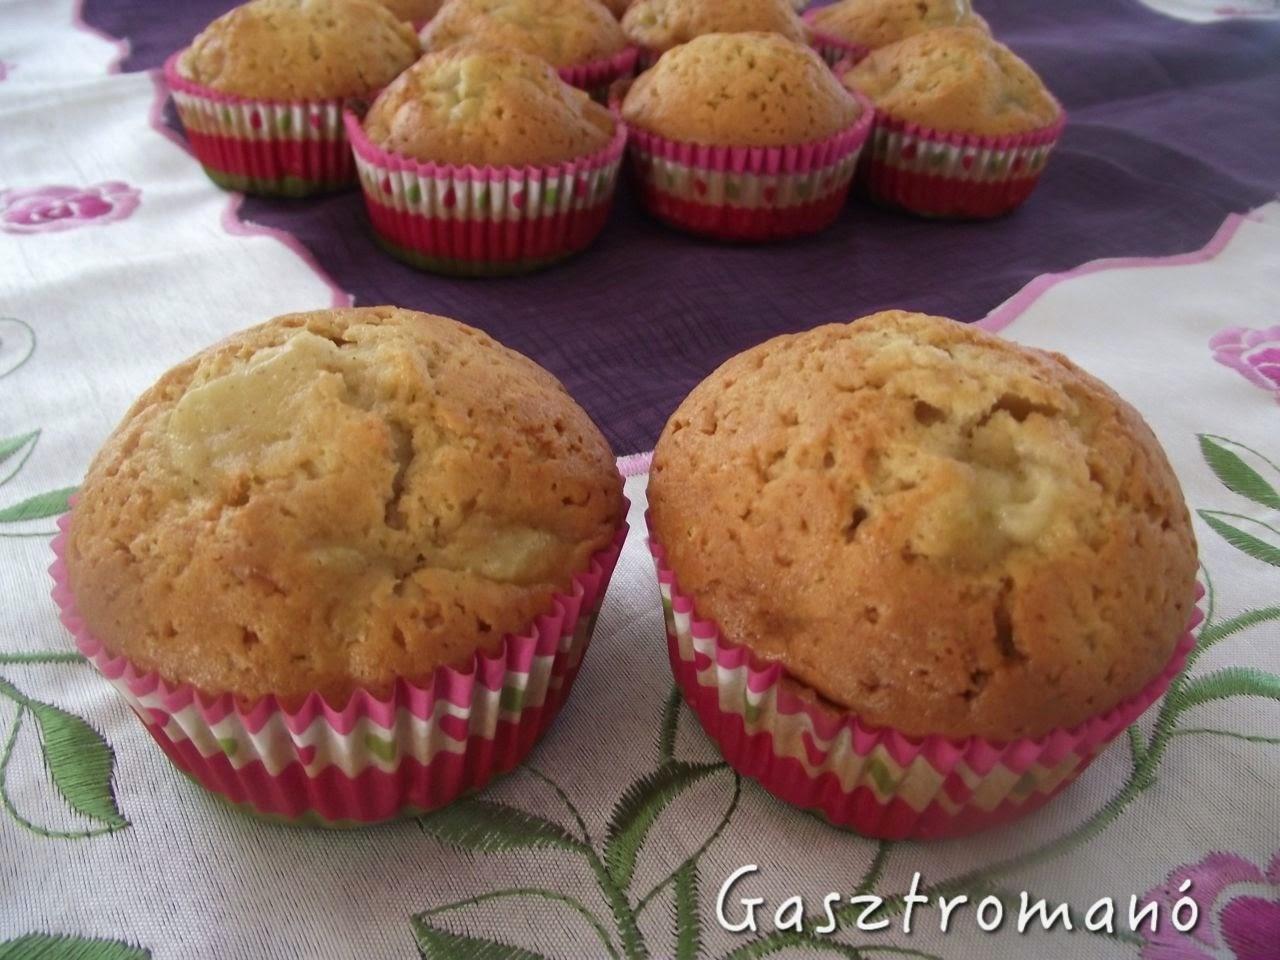 mézes körtés muffin recept